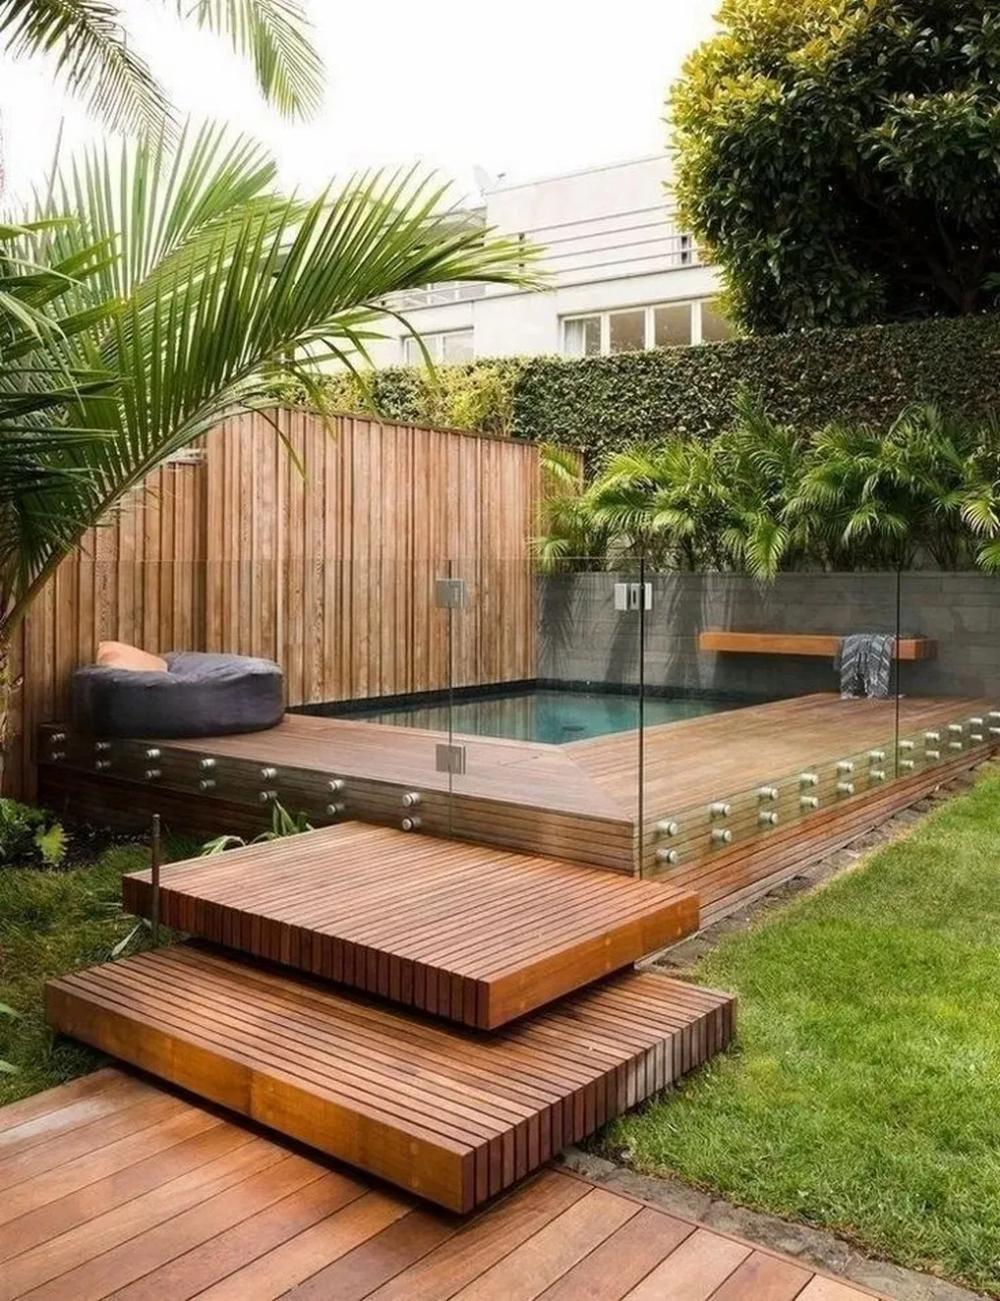 15 Amazing Garden Tub Decor Ideas This Year 32 Inspiredesign Small Backyard Landscaping Backyard Backyard Design